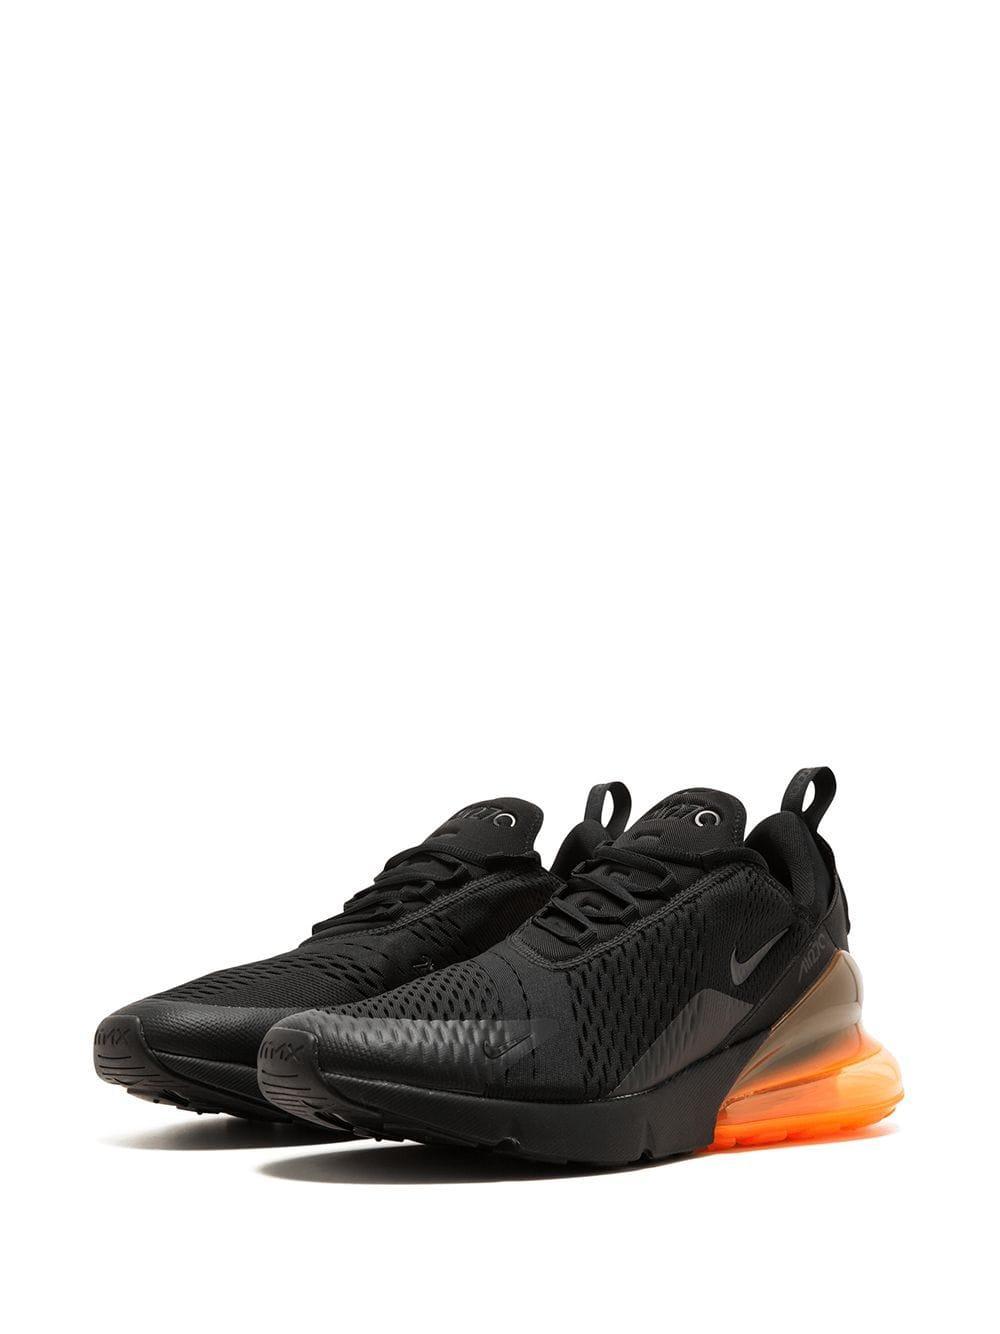 427a757ffa Nike Air Max 270 Sneakers in Black for Men - Lyst